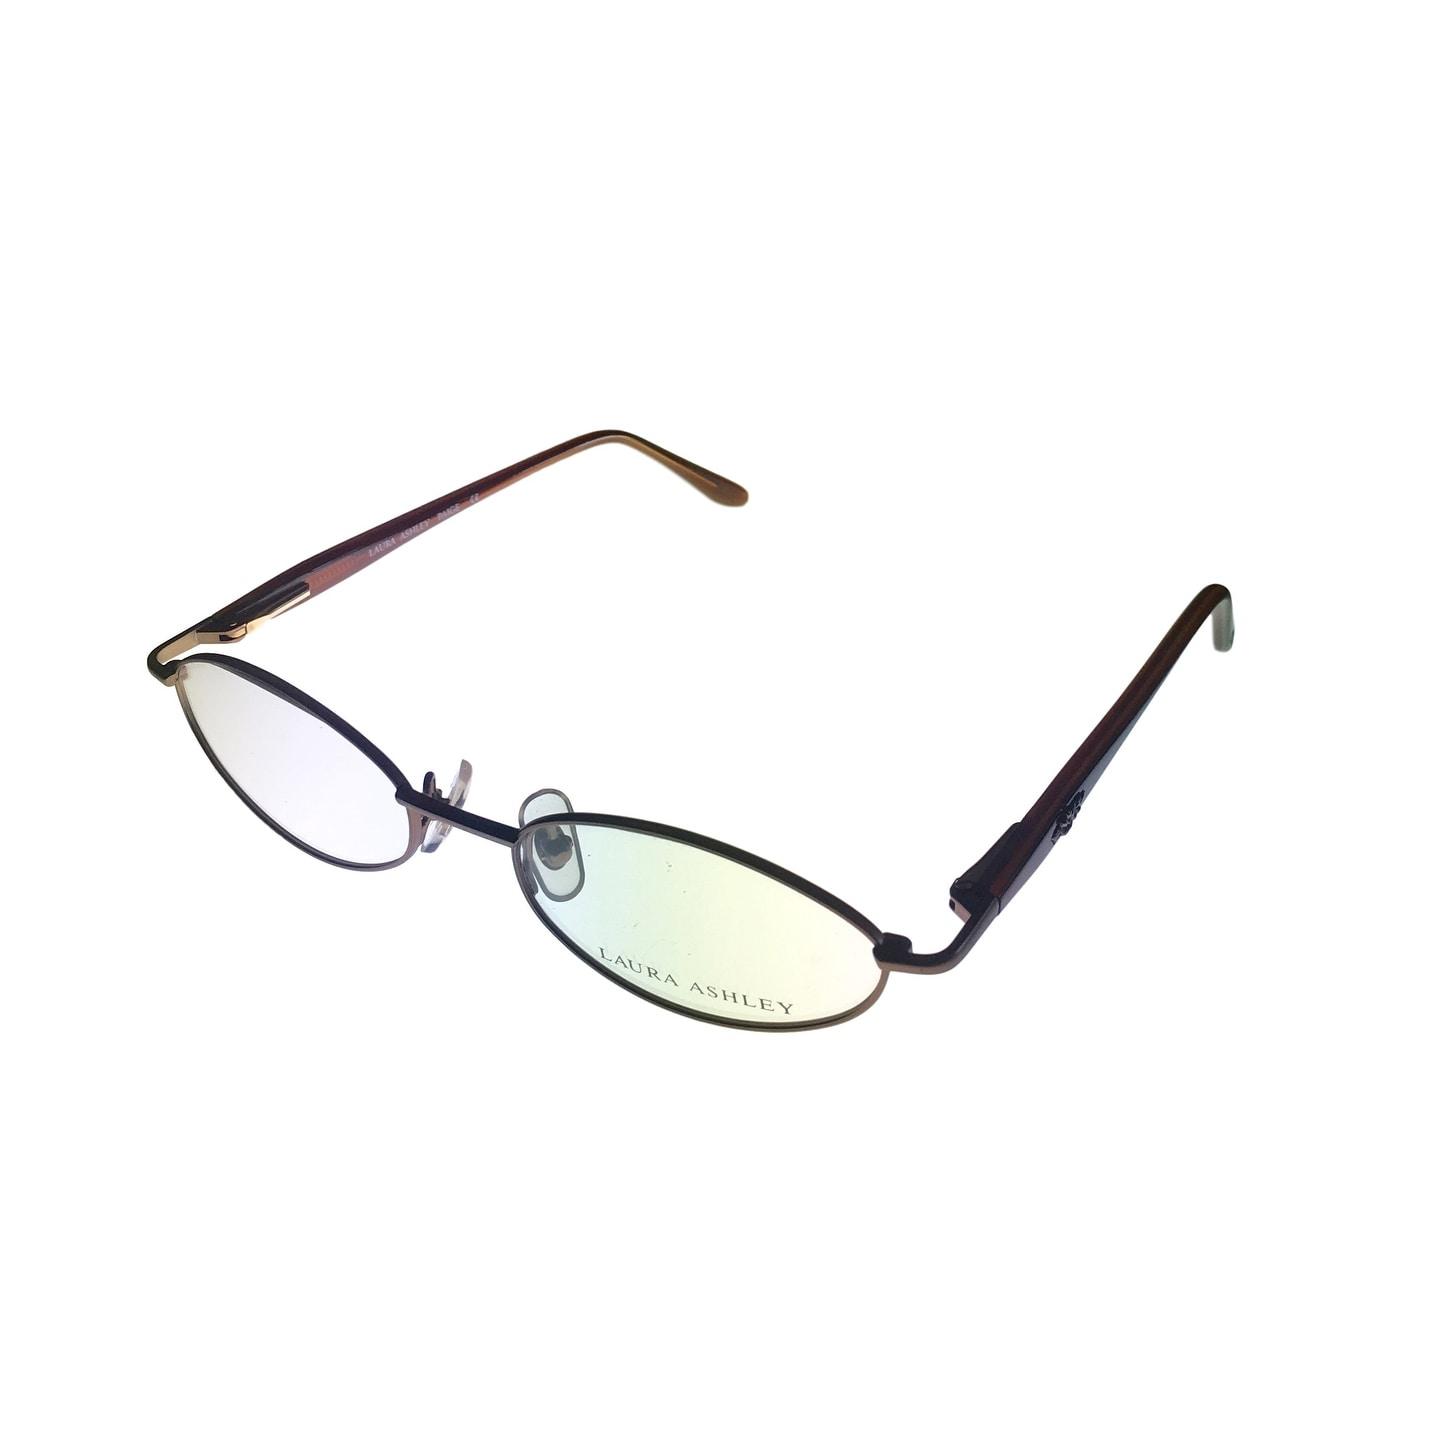 Laura Ashley Womens Opthalmic Eyeglass Modified Rectangle Metal, Page Toffee - Medium - Thumbnail 0